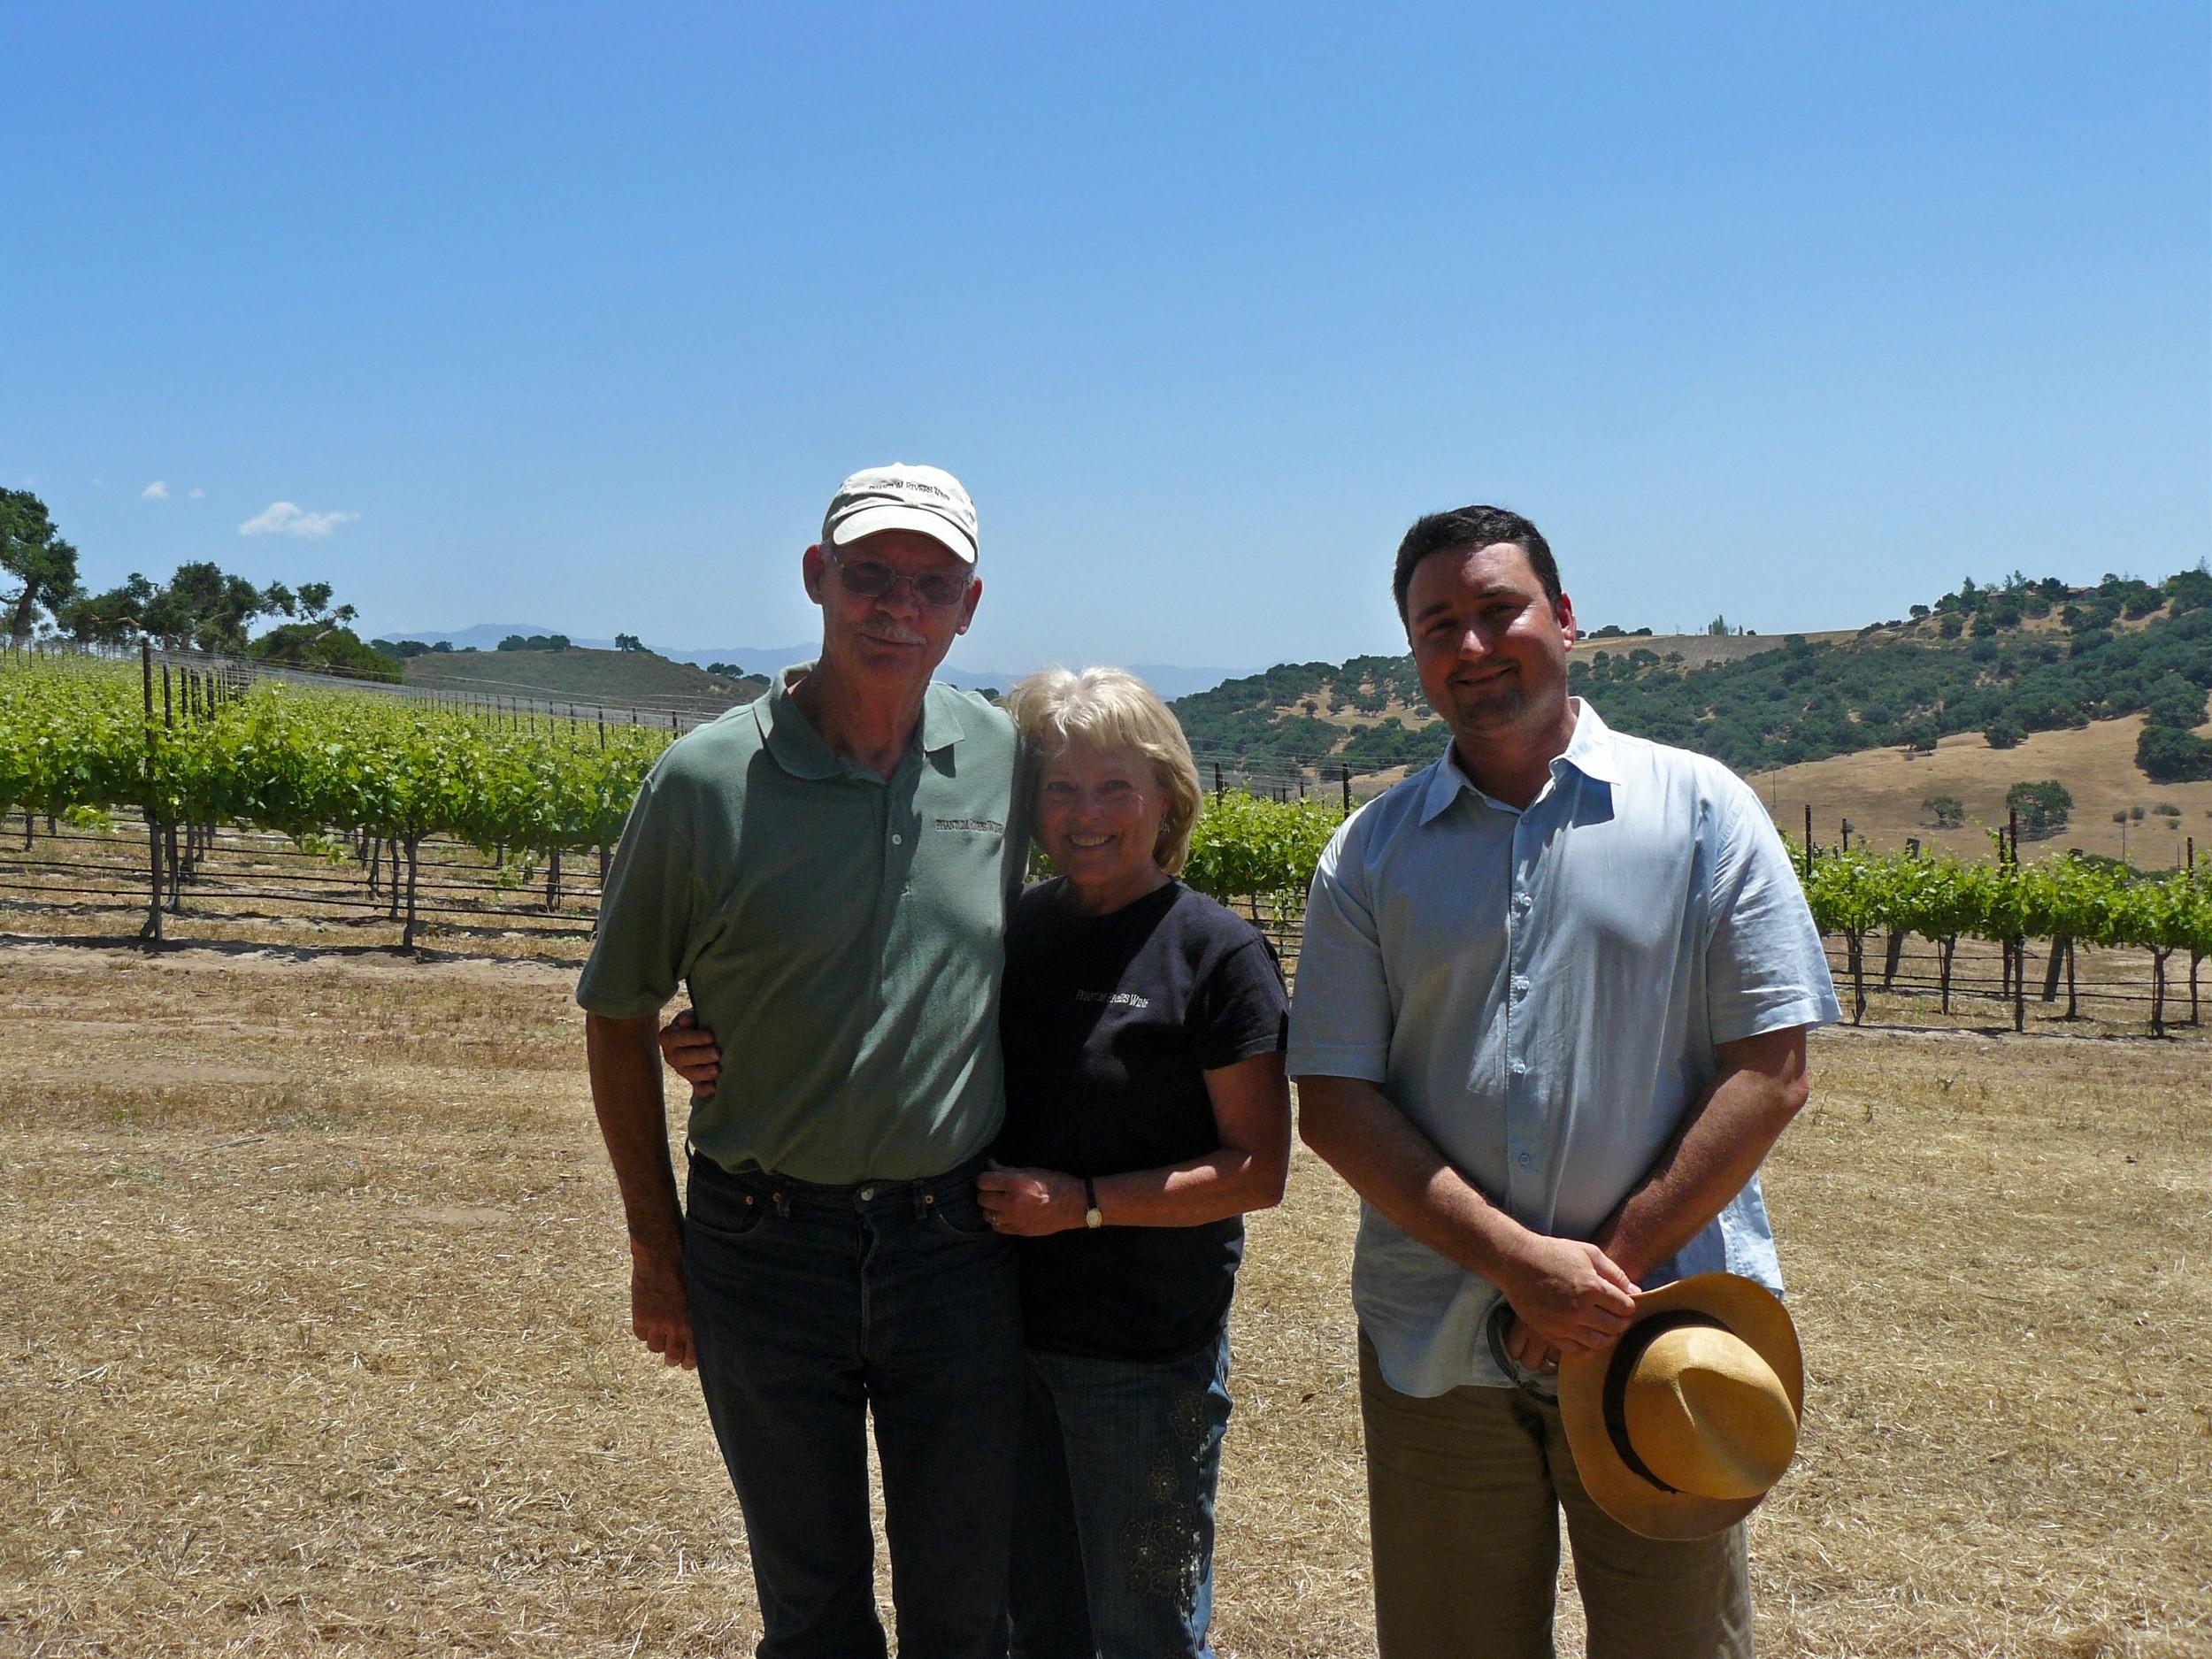 John & Linda Thunen with Michael Larner, owner of Larner Vineyards